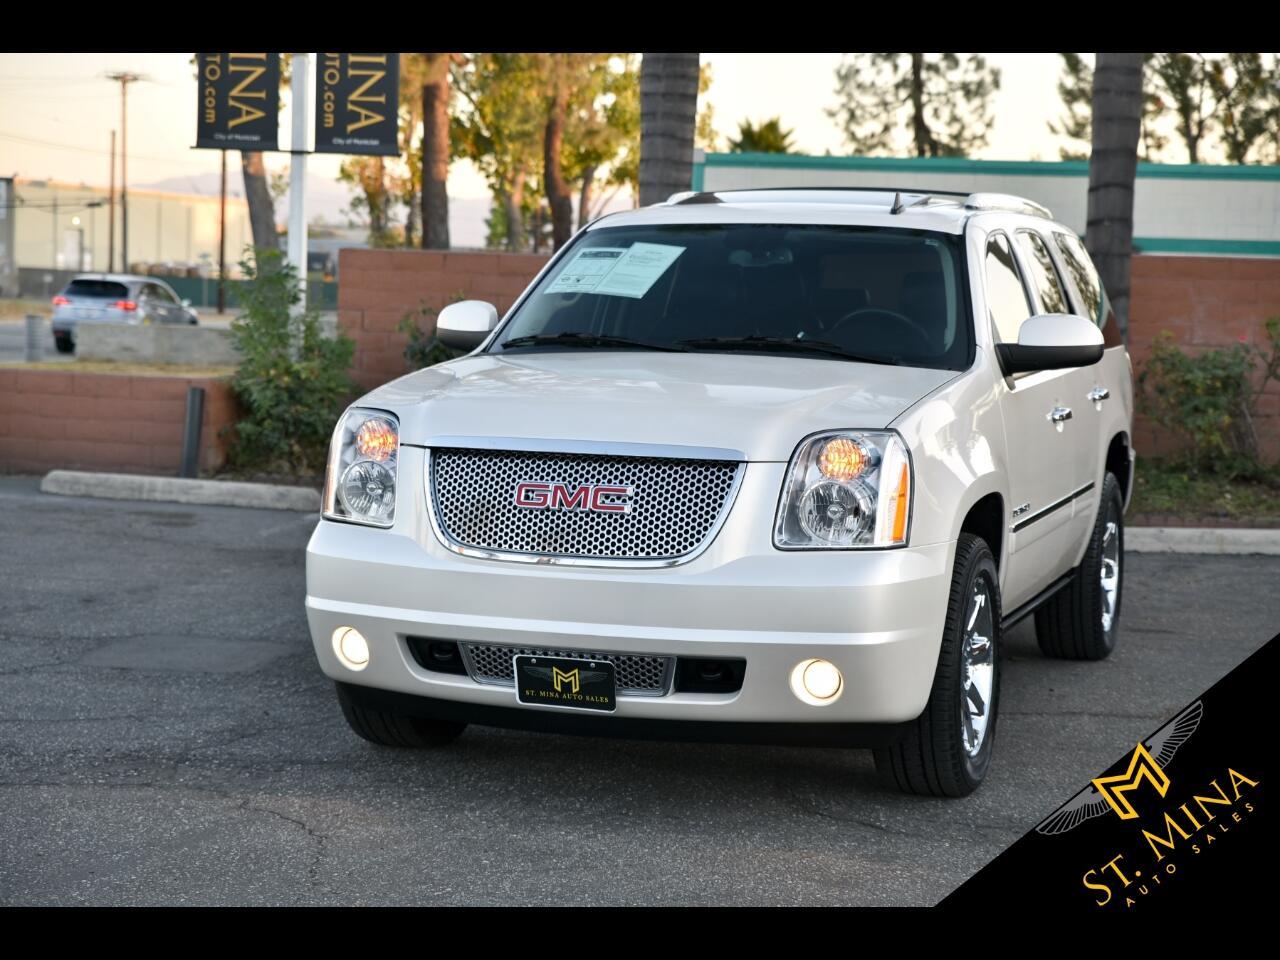 2011 GMC Yukon Denali 2WD